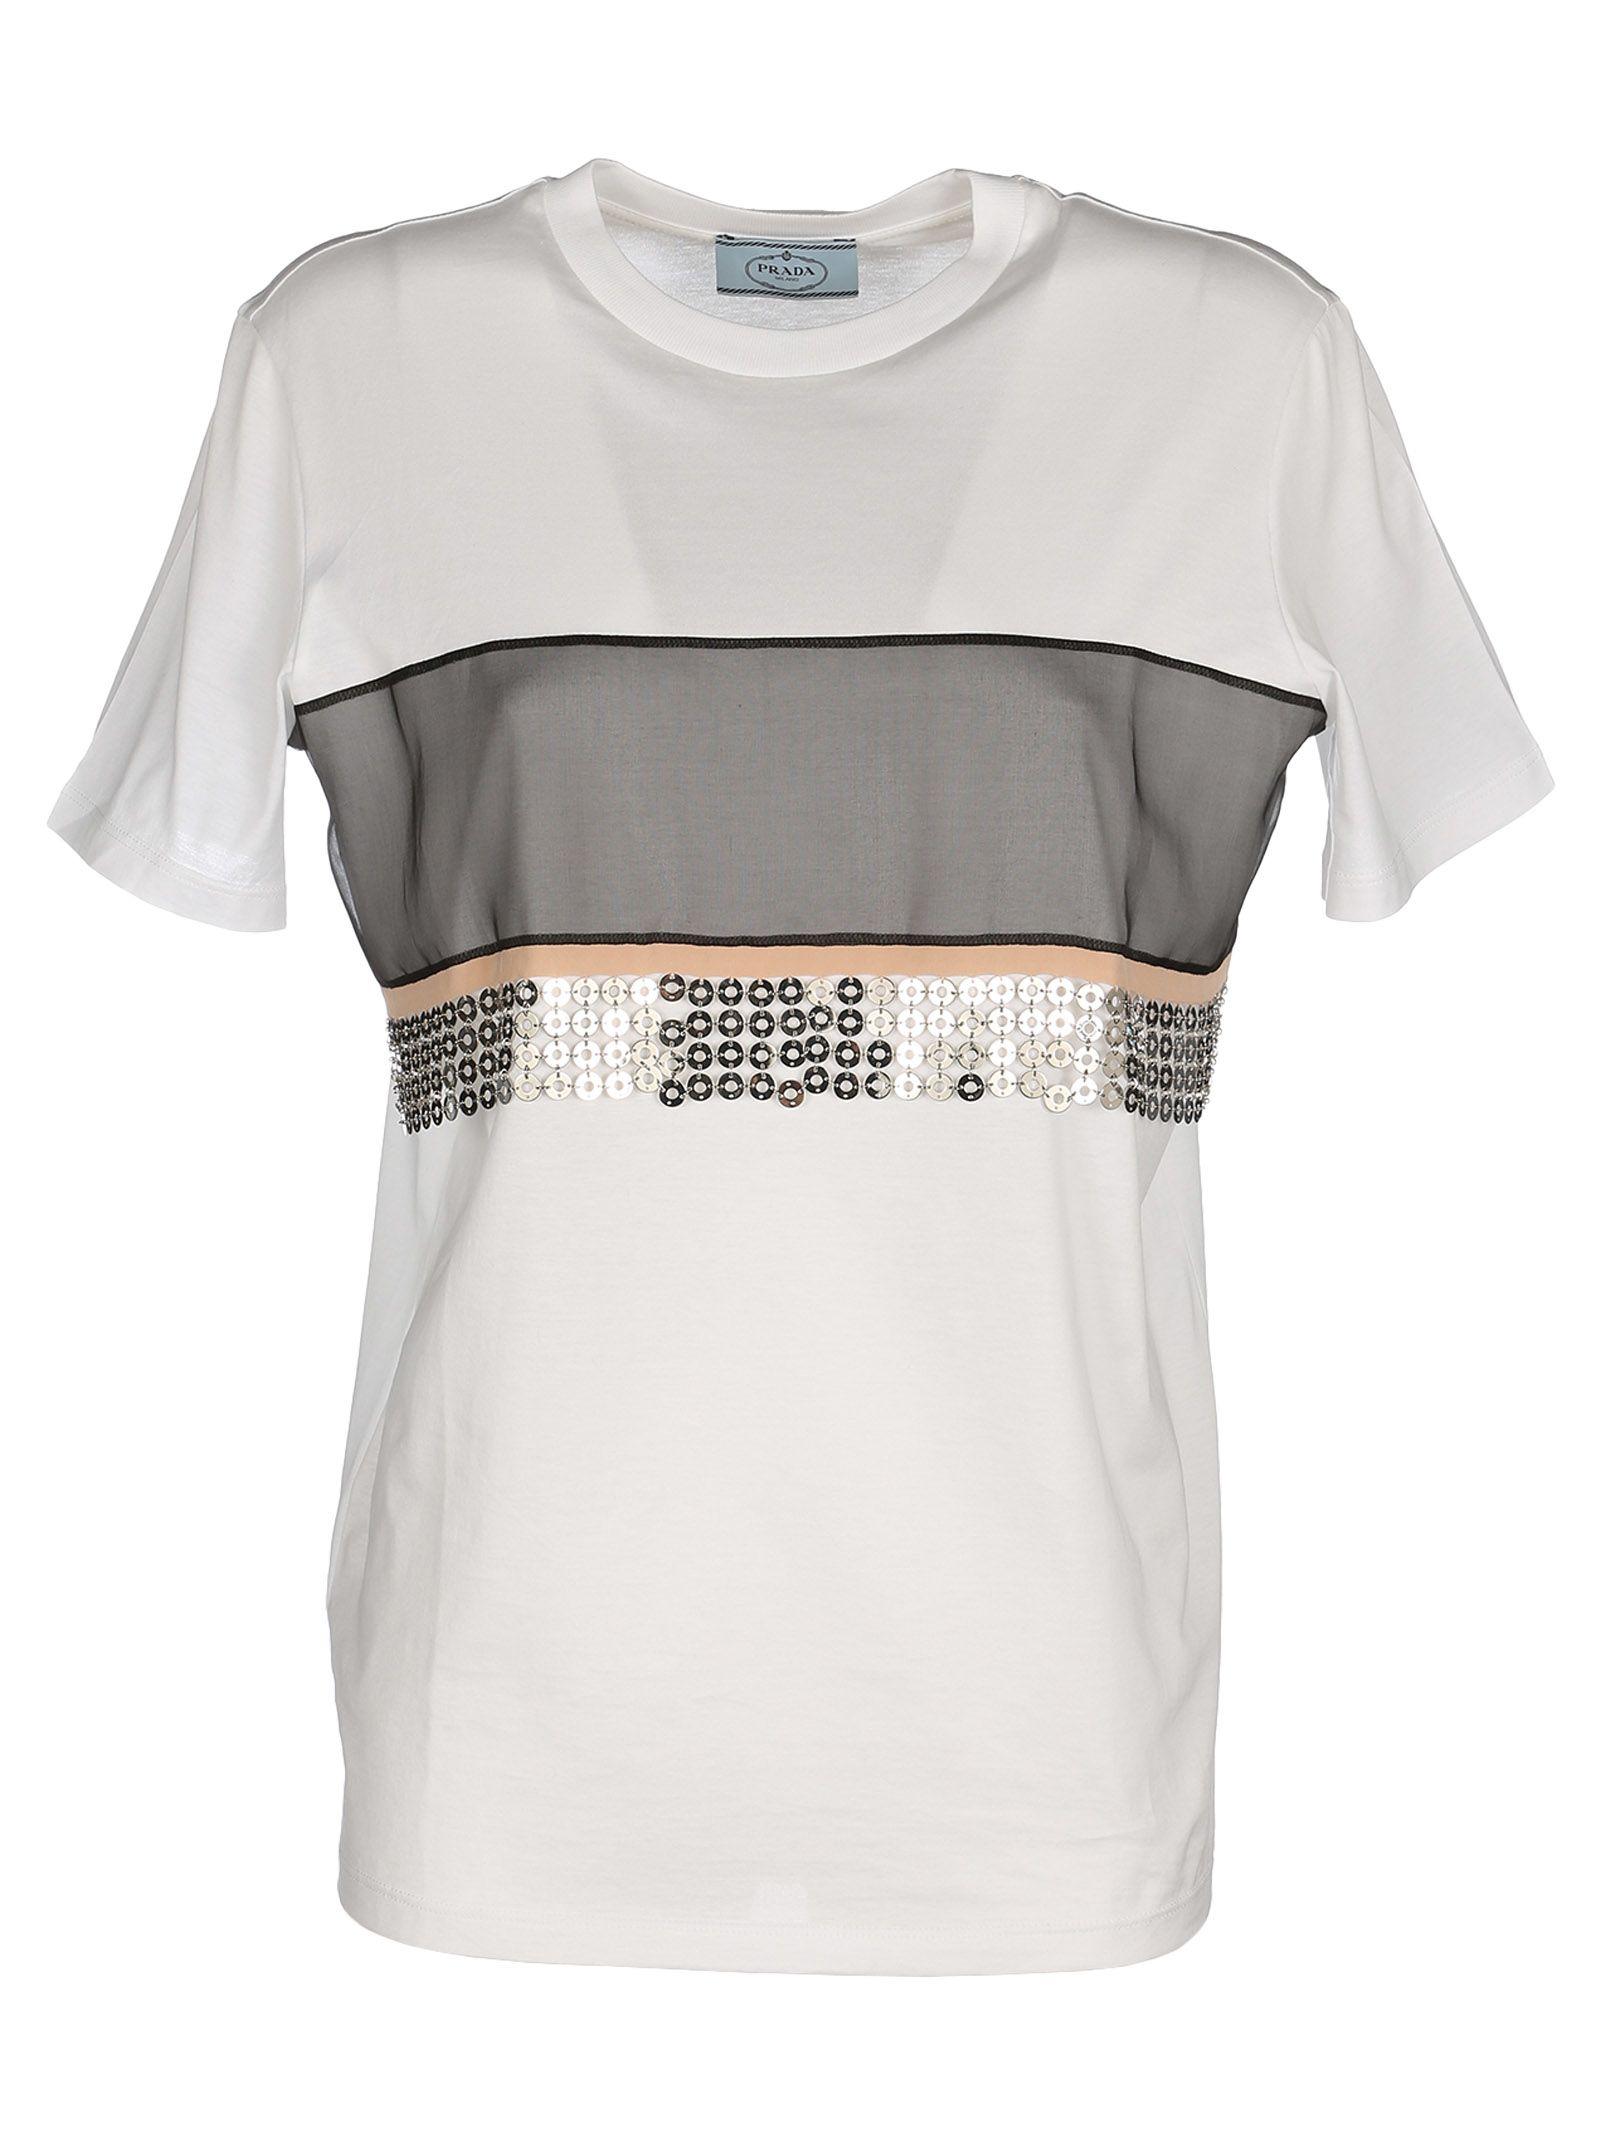 Prada Sequin Panel T-shirt